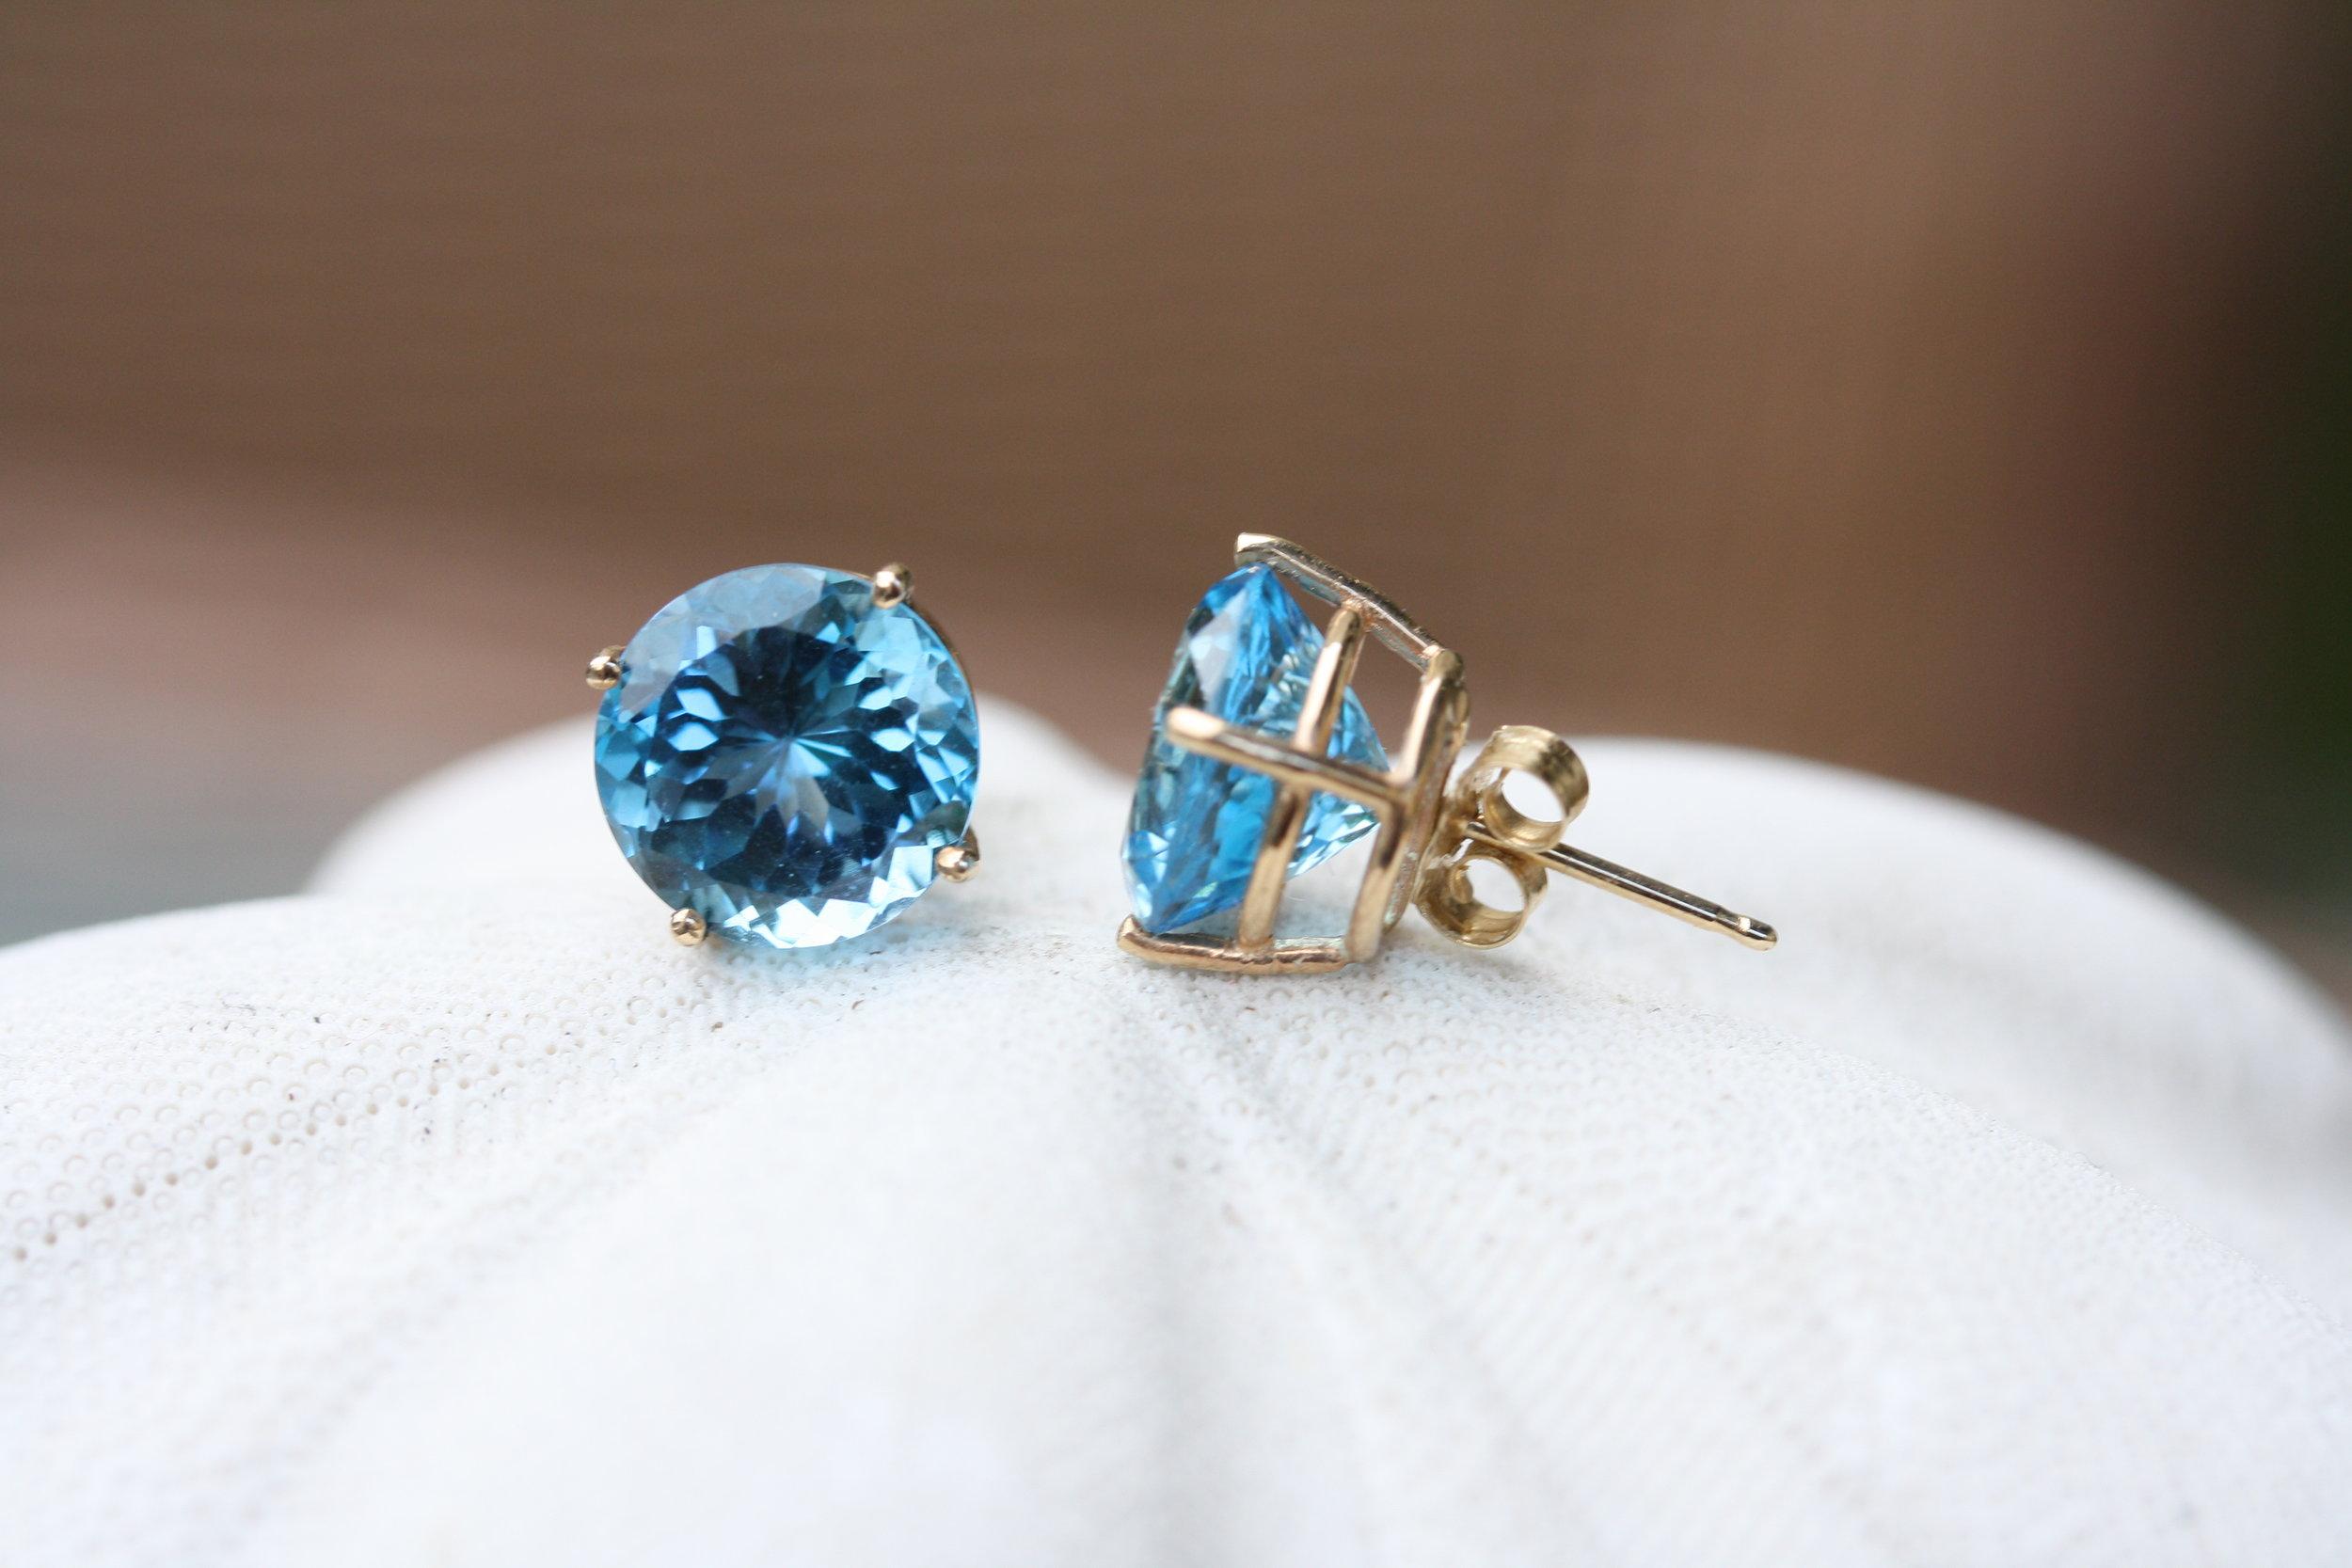 Stud Earrings Blue Topaz Round 14KY-STUD-RD-BTO-14KY_03 copy.JPG